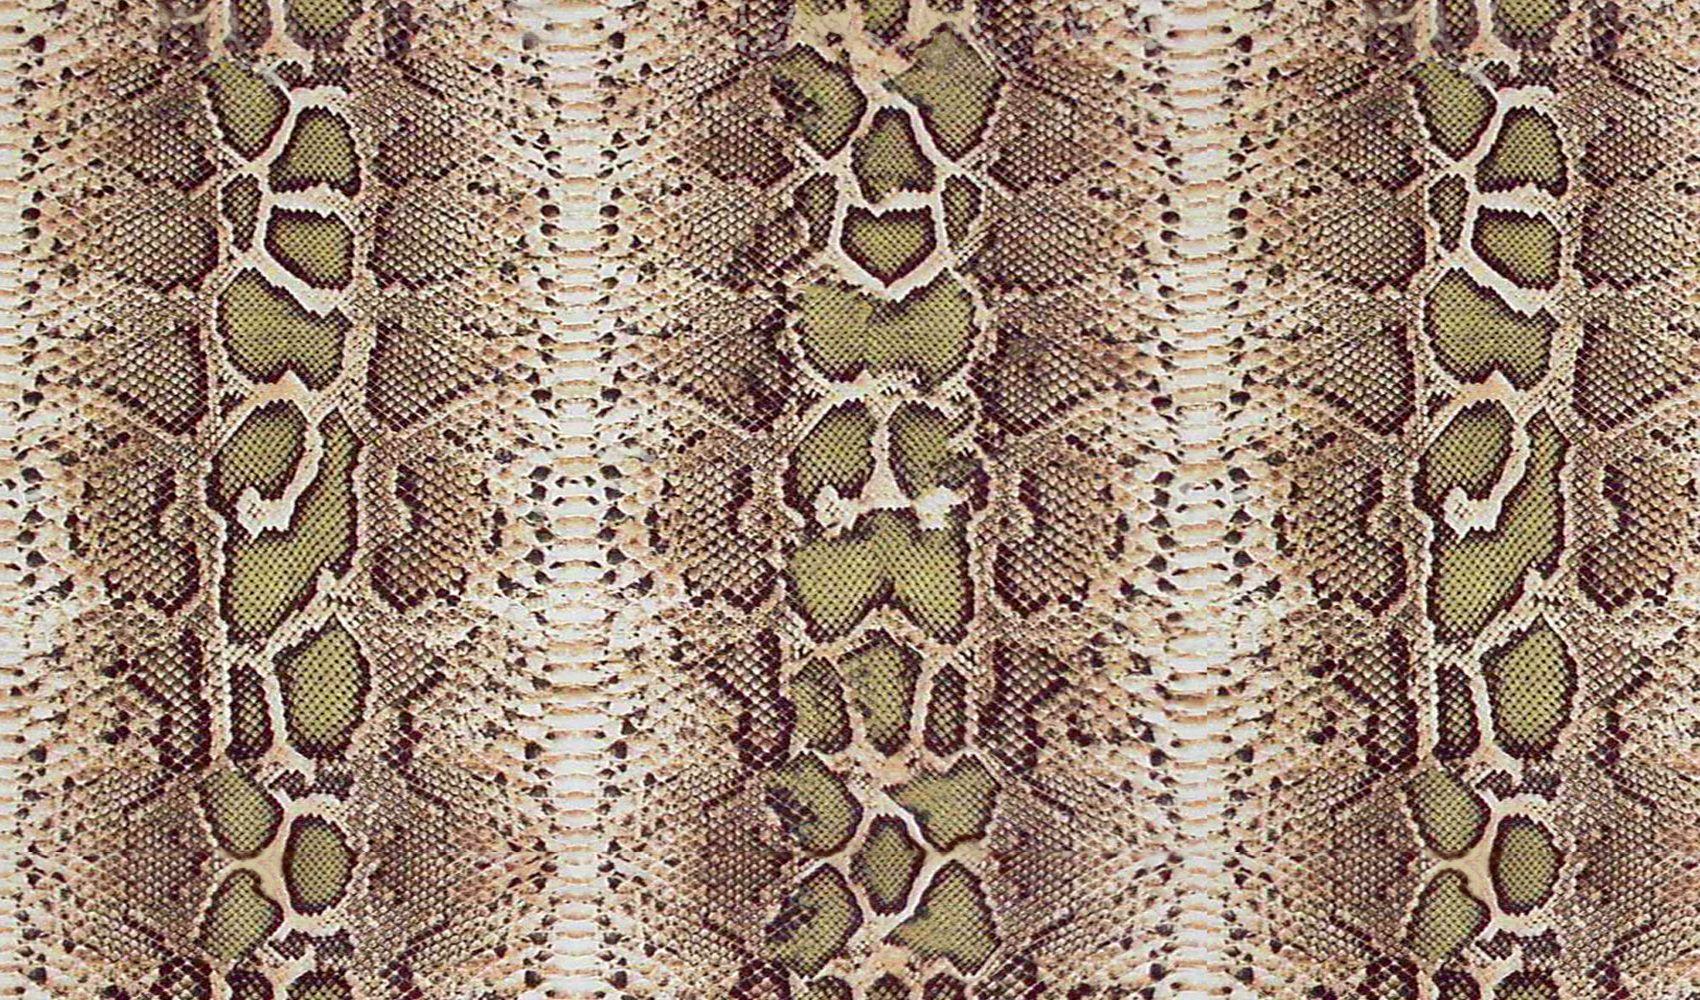 Snakeskin Print Wallpaper Free Download Hd Widescreen